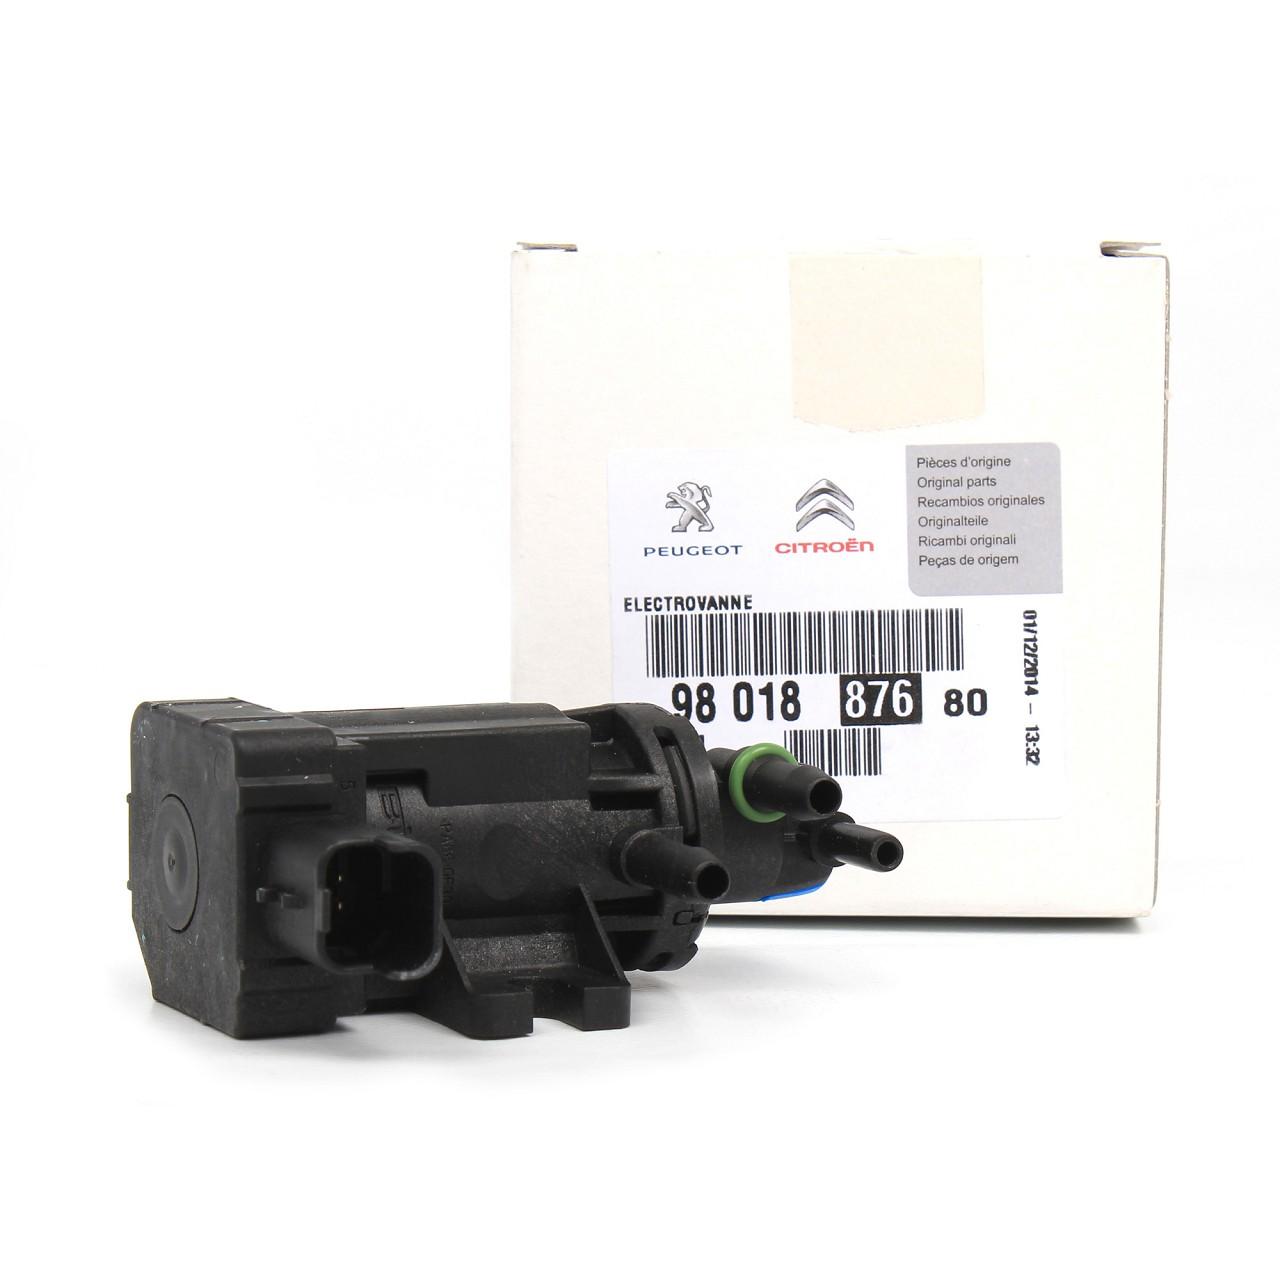 ORIGINAL Citroen Peugeot Unterdrucksensor Ladedrucksensor Turbolader 9801887680